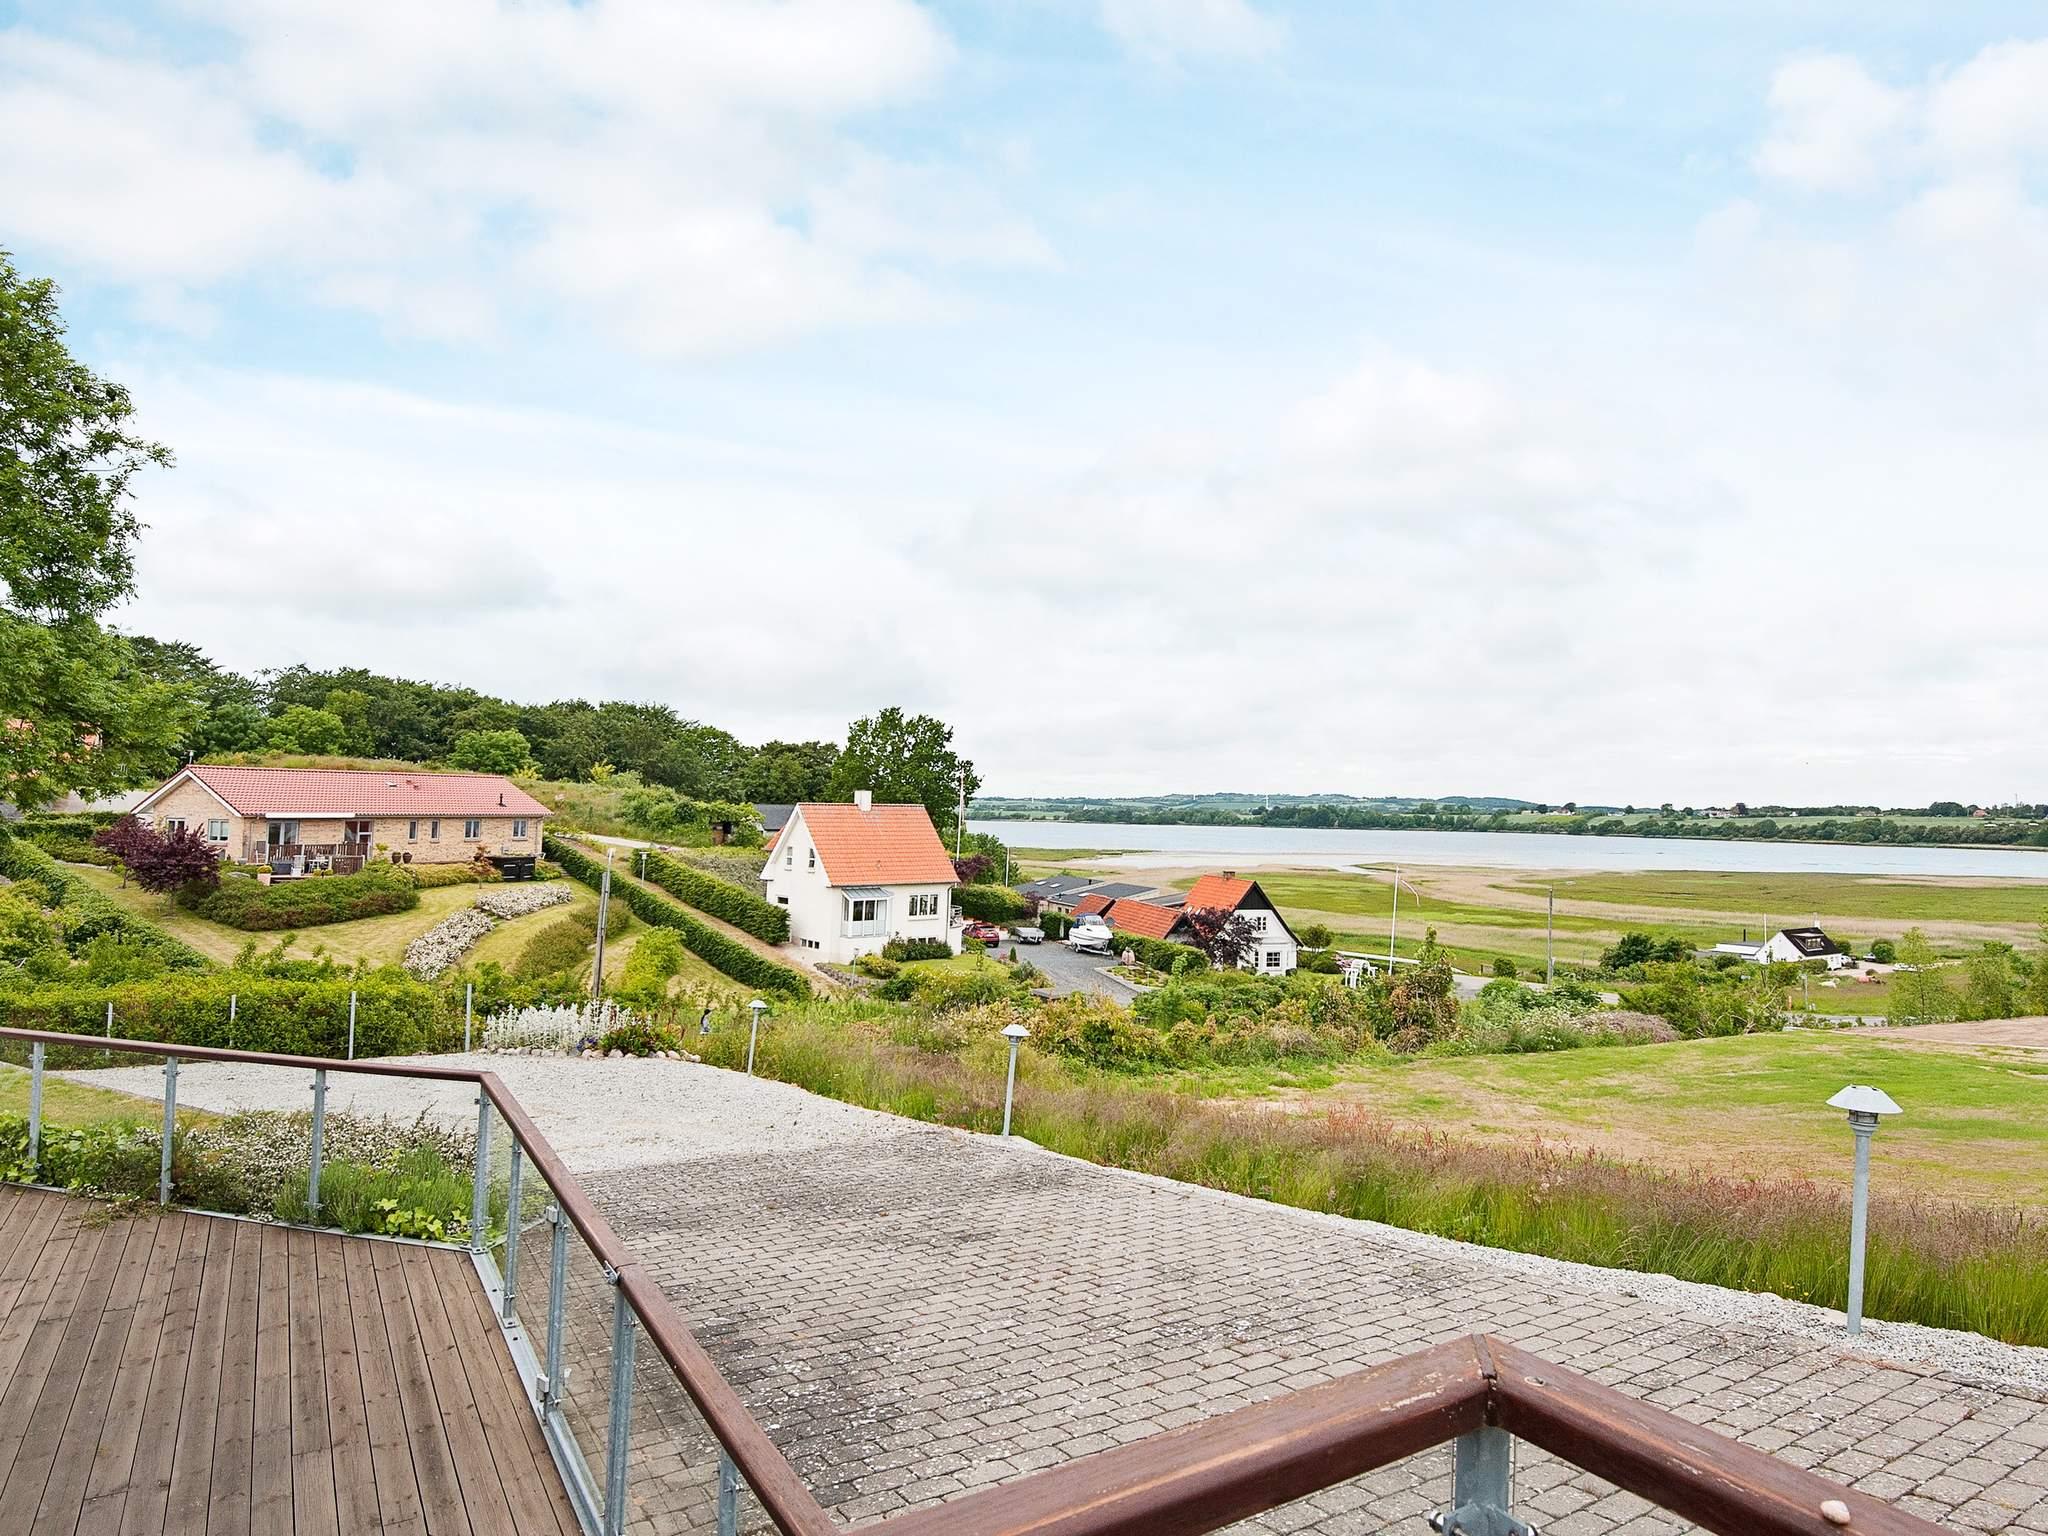 Ferienhaus Hejlsminde Strand (1585399), Hejls, , Südostjütland, Dänemark, Bild 27